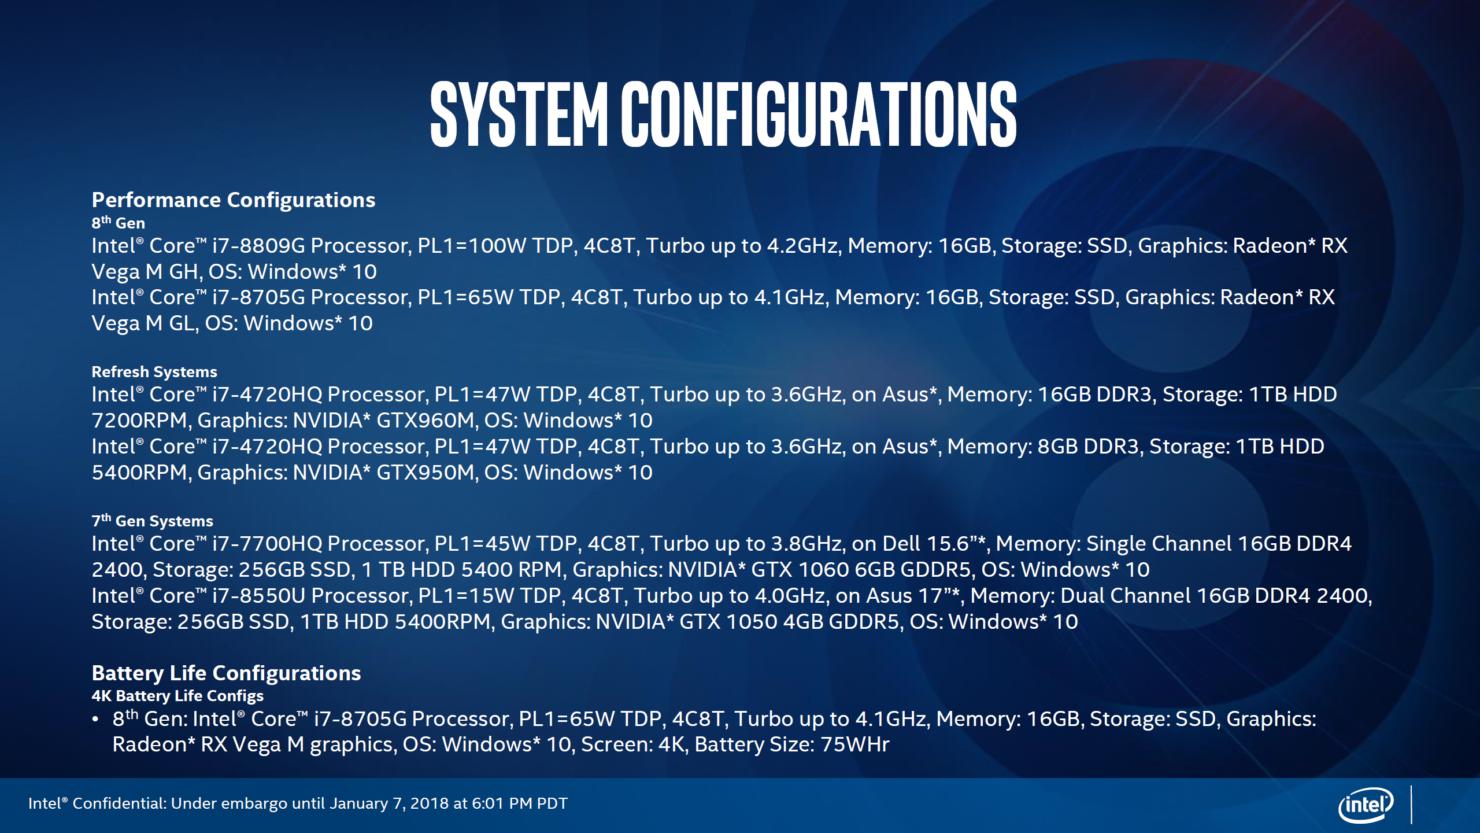 intel-8th-generation-core-processors-with-amd-radeon-rx-vega-m-graphics_27-2